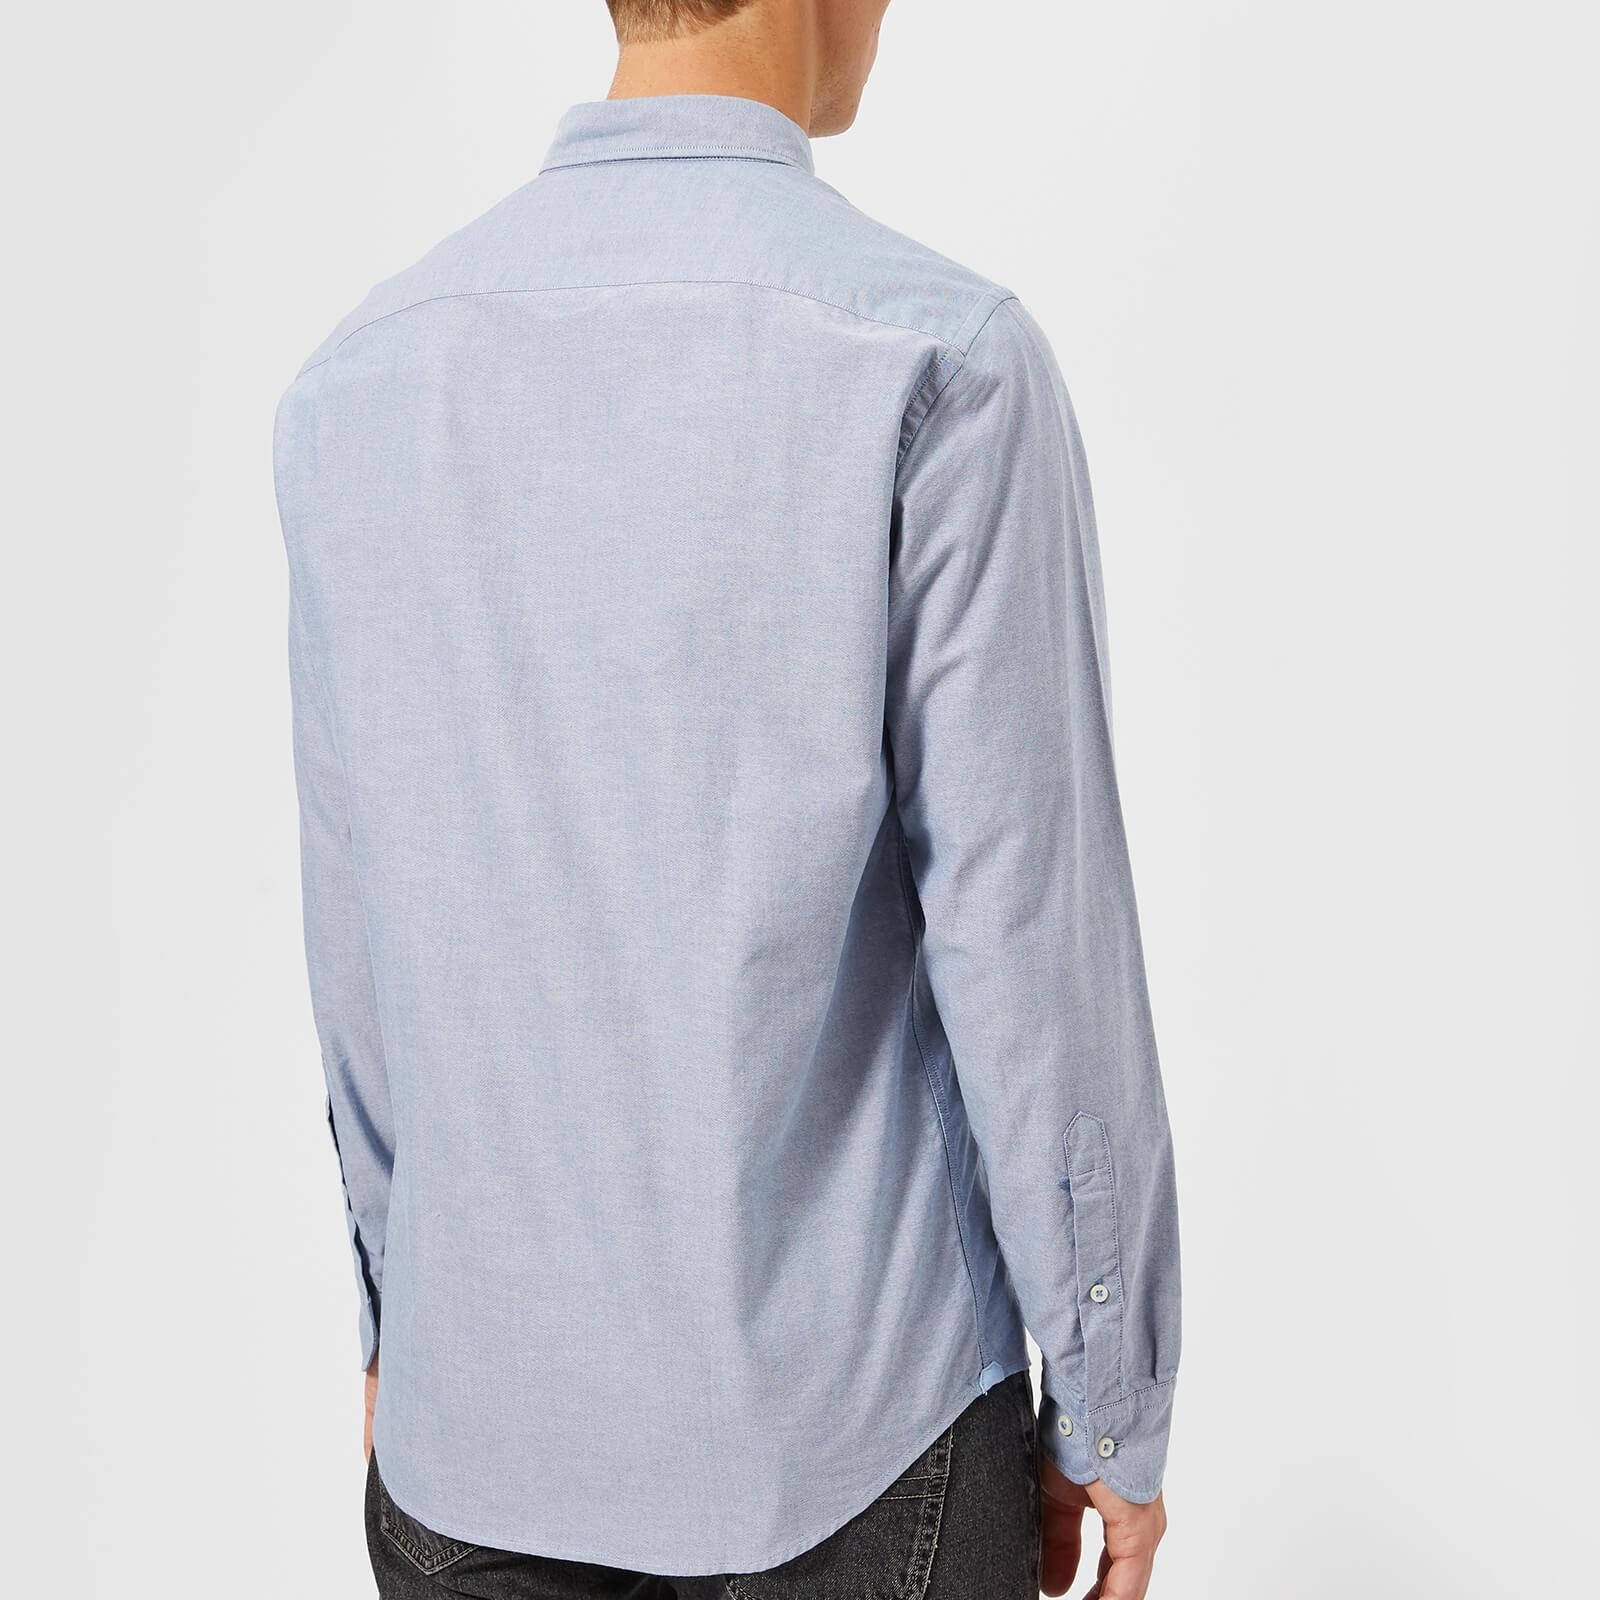 0638177d1f84 Tommy Hilfiger - Blue Engineered Oxford Long Sleeve Shirt for Men - Lyst.  View fullscreen